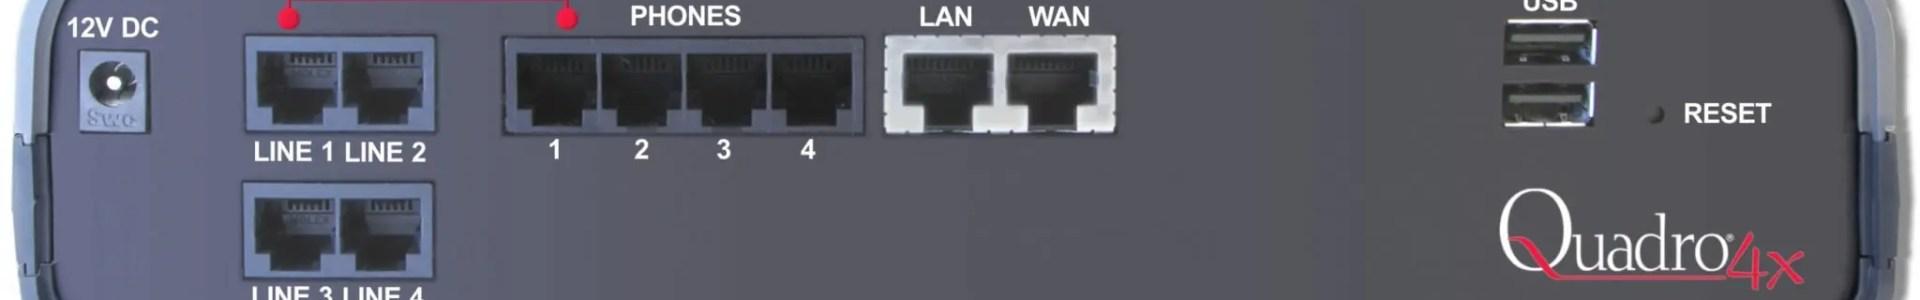 Quadro 4x / 4 FXO – מרכזיה